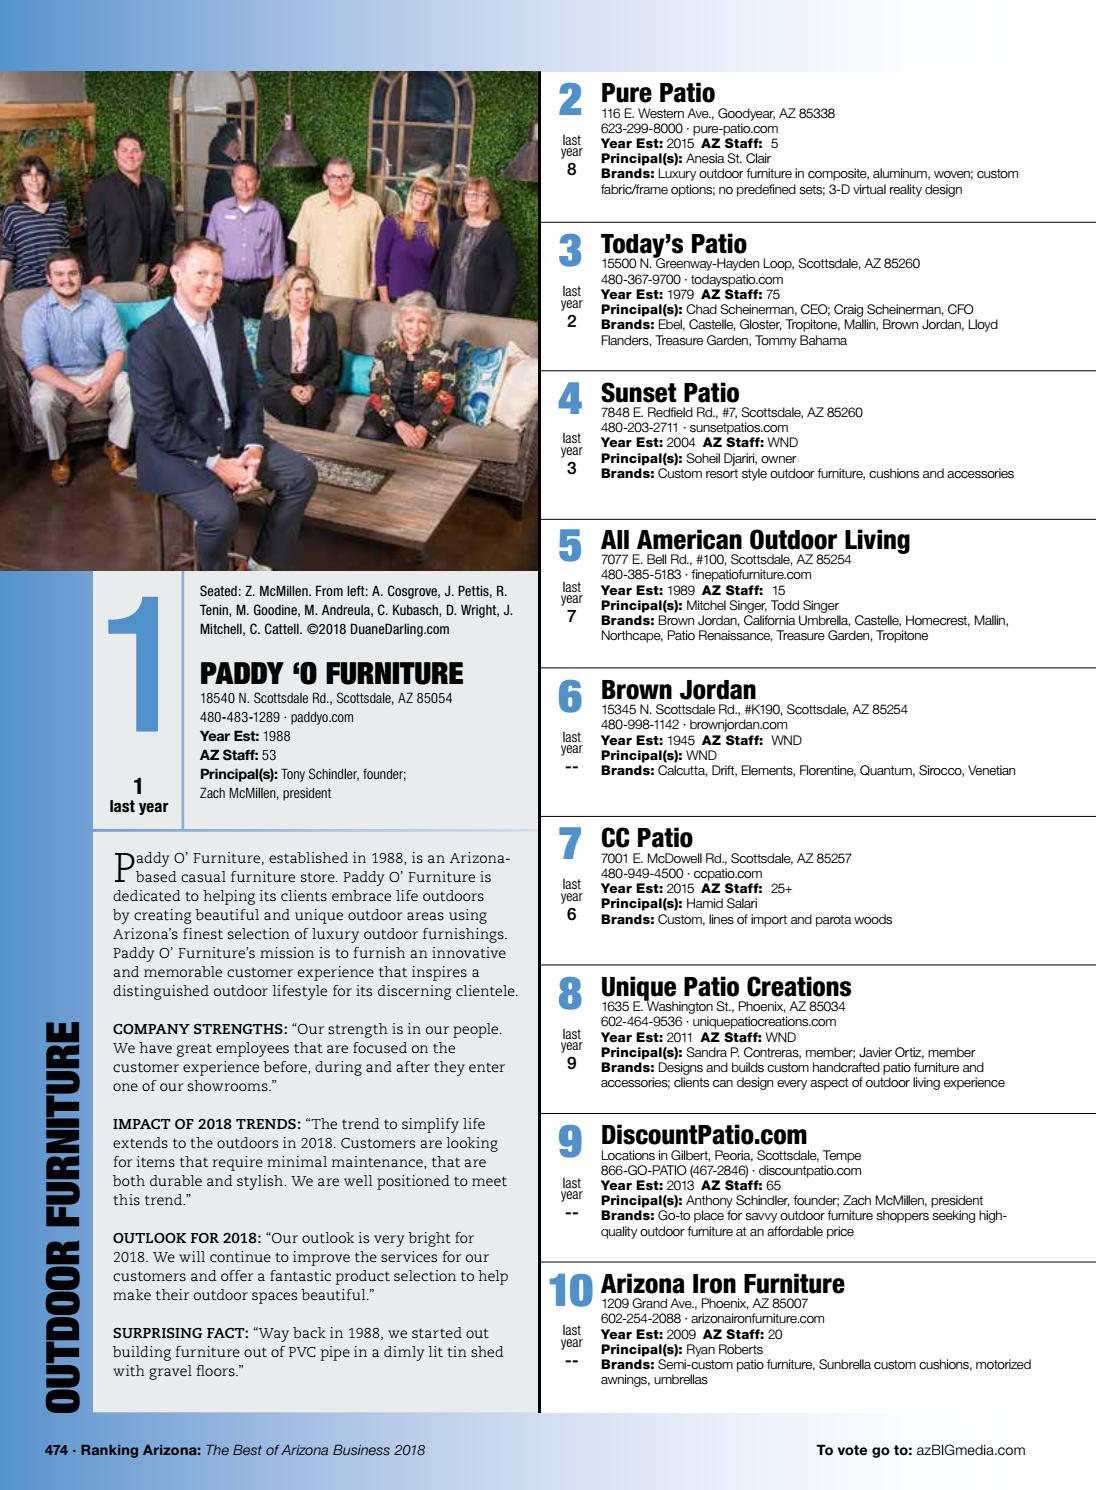 ranking arizona 2018 digital issue by